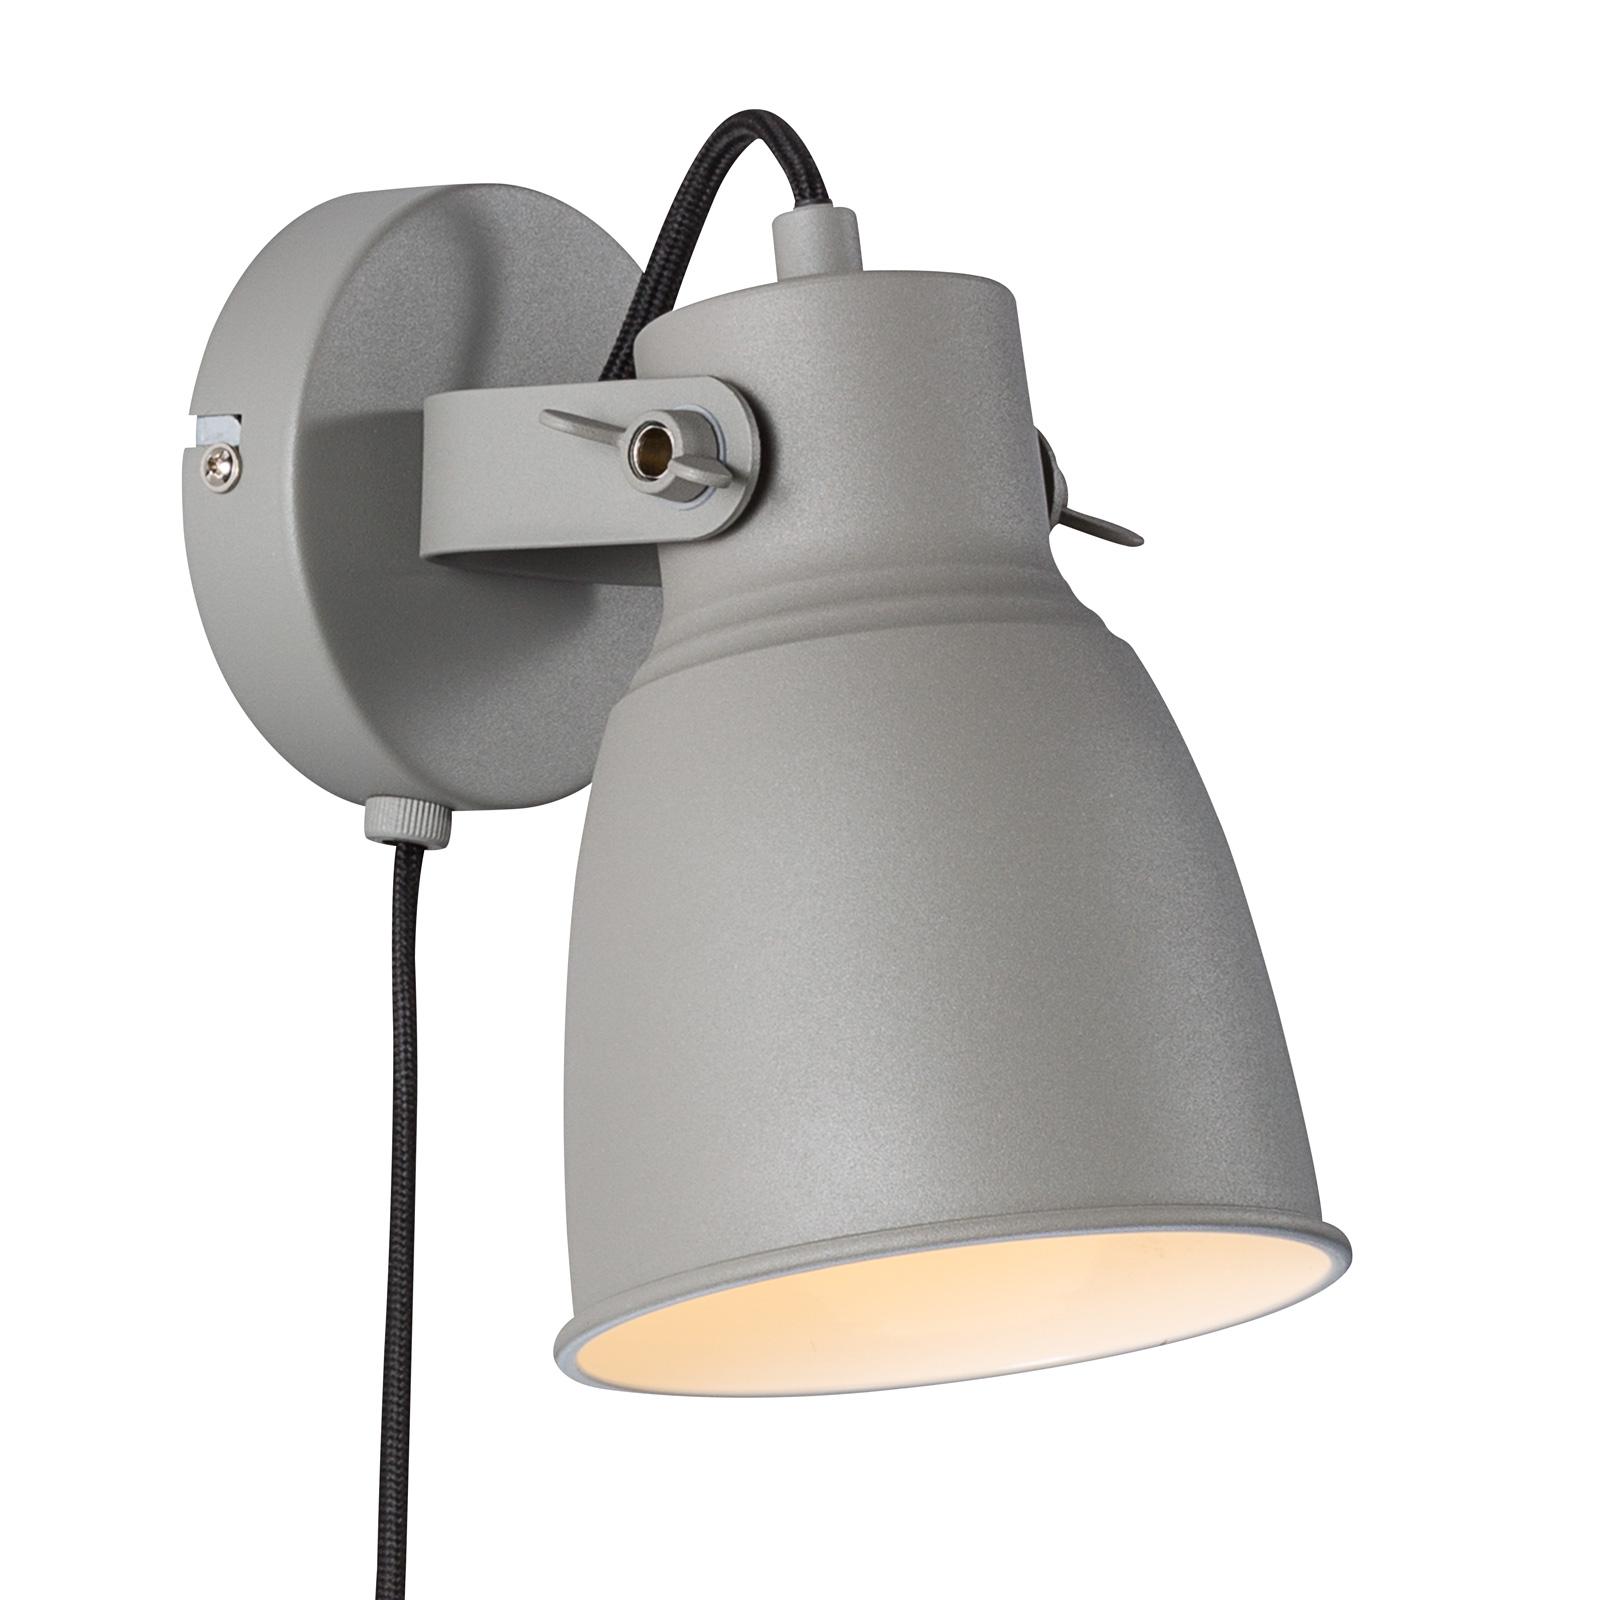 Wandlamp Adrian met kabel en stekker, grijs